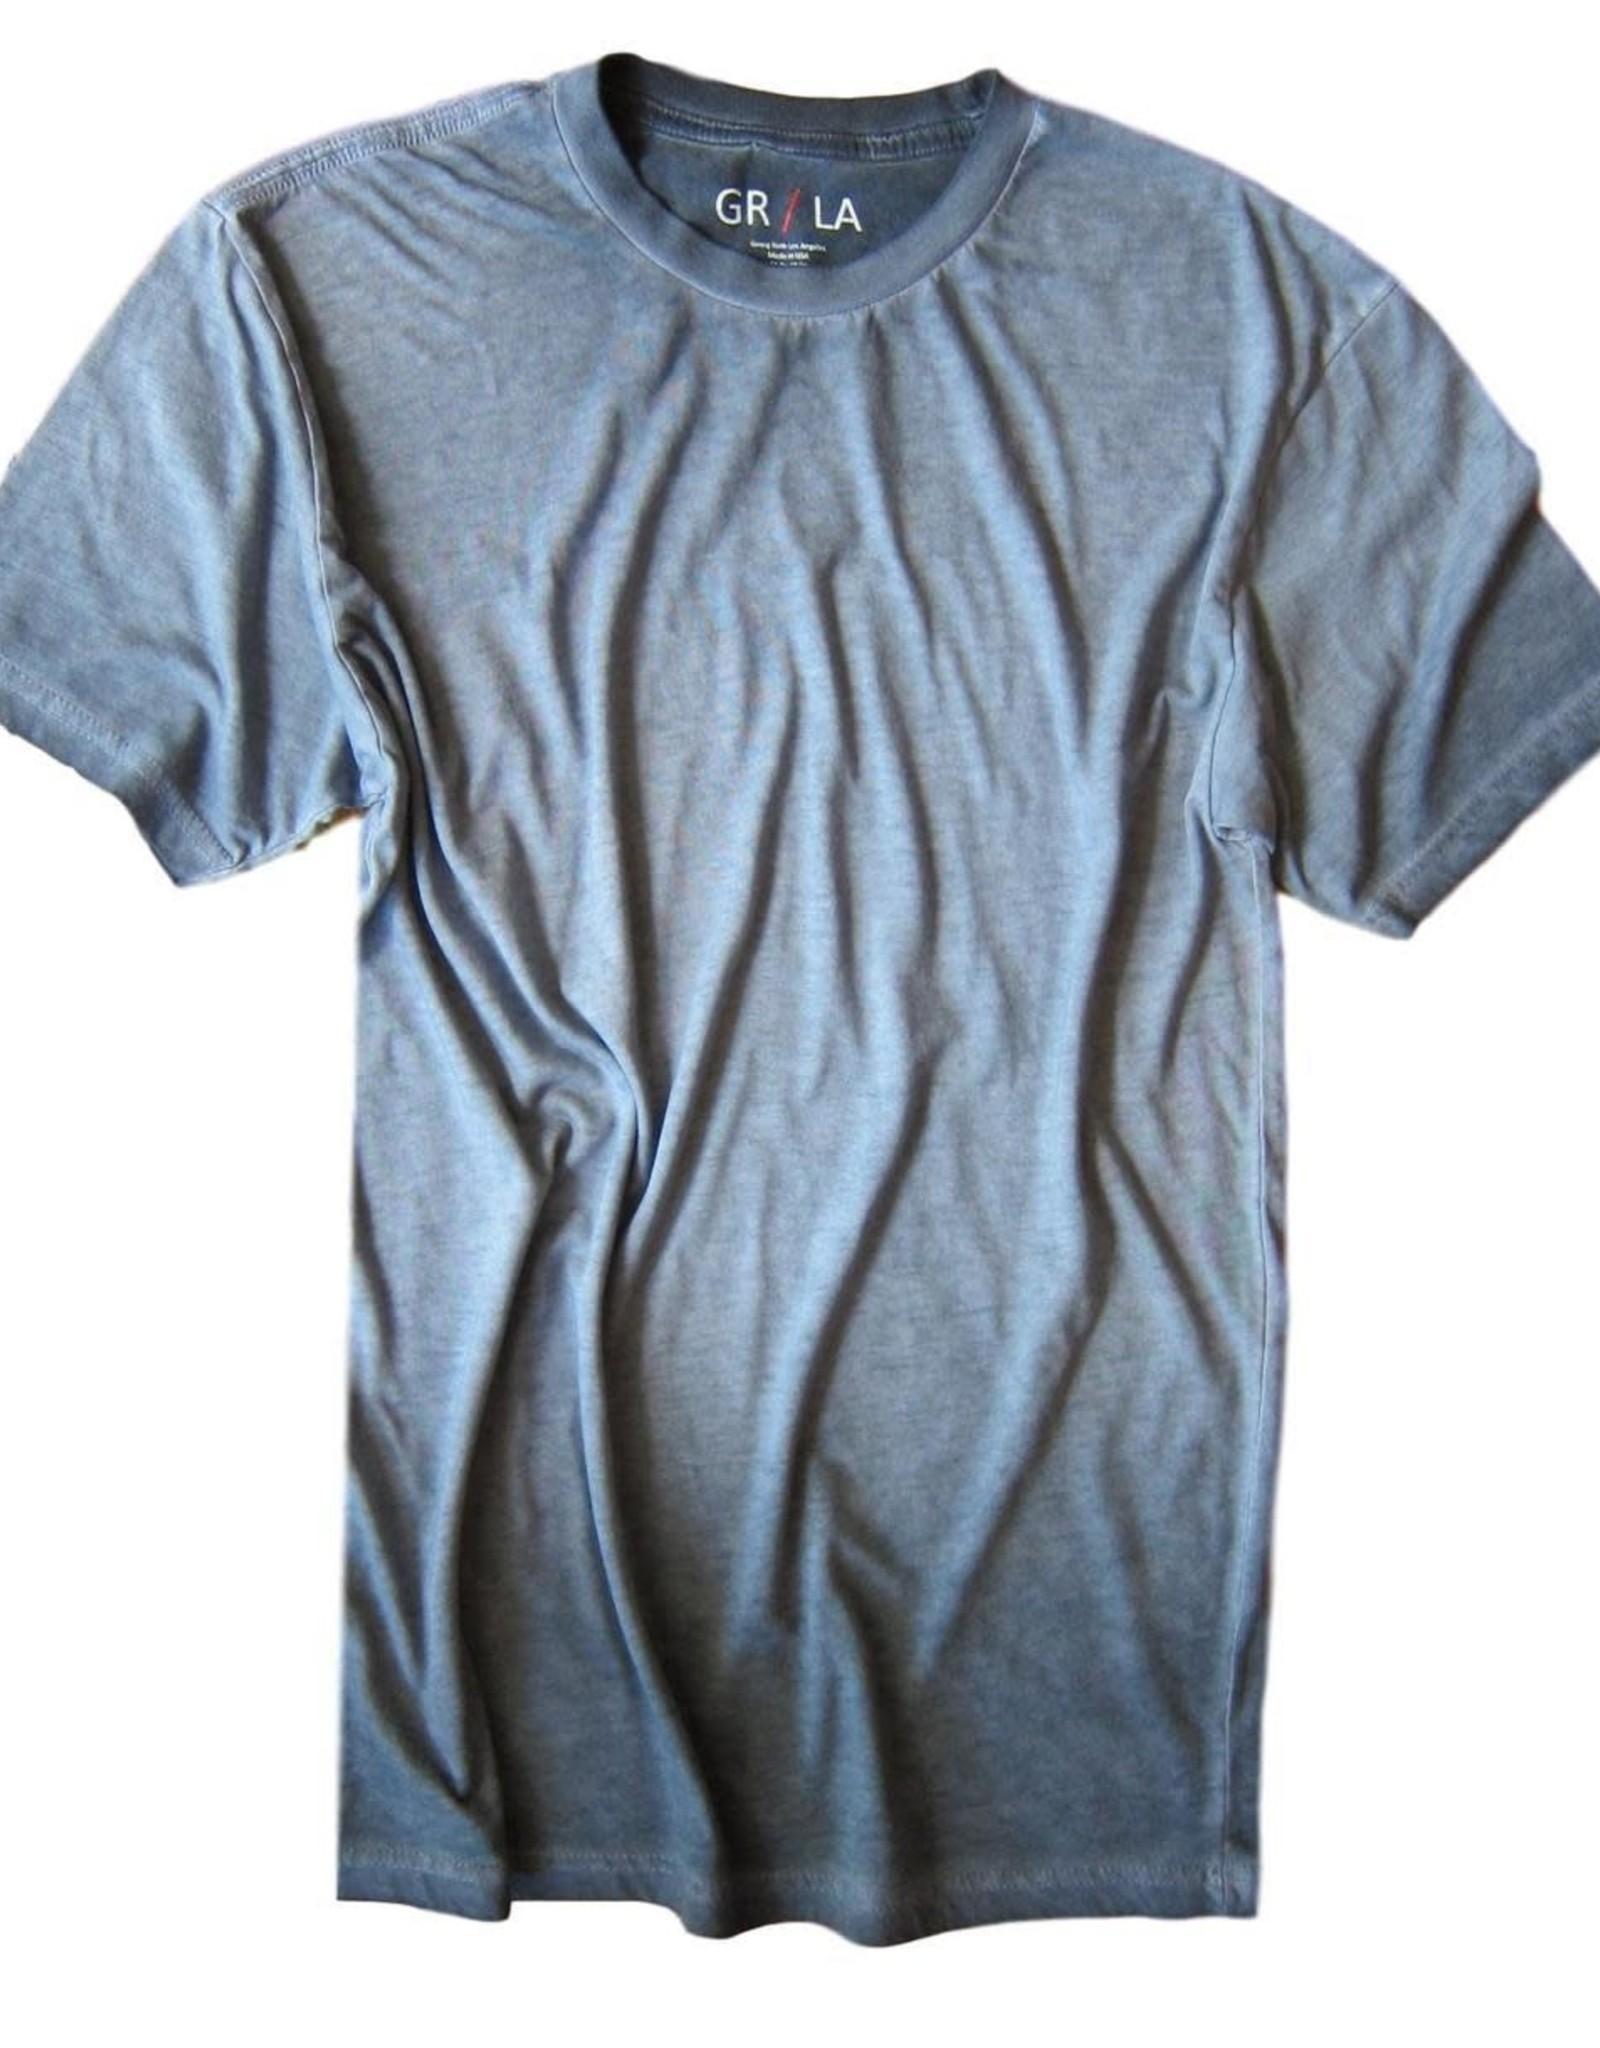 Georg Roth Crew Neck Short Sleeves Garment Dyed-T-Shirt